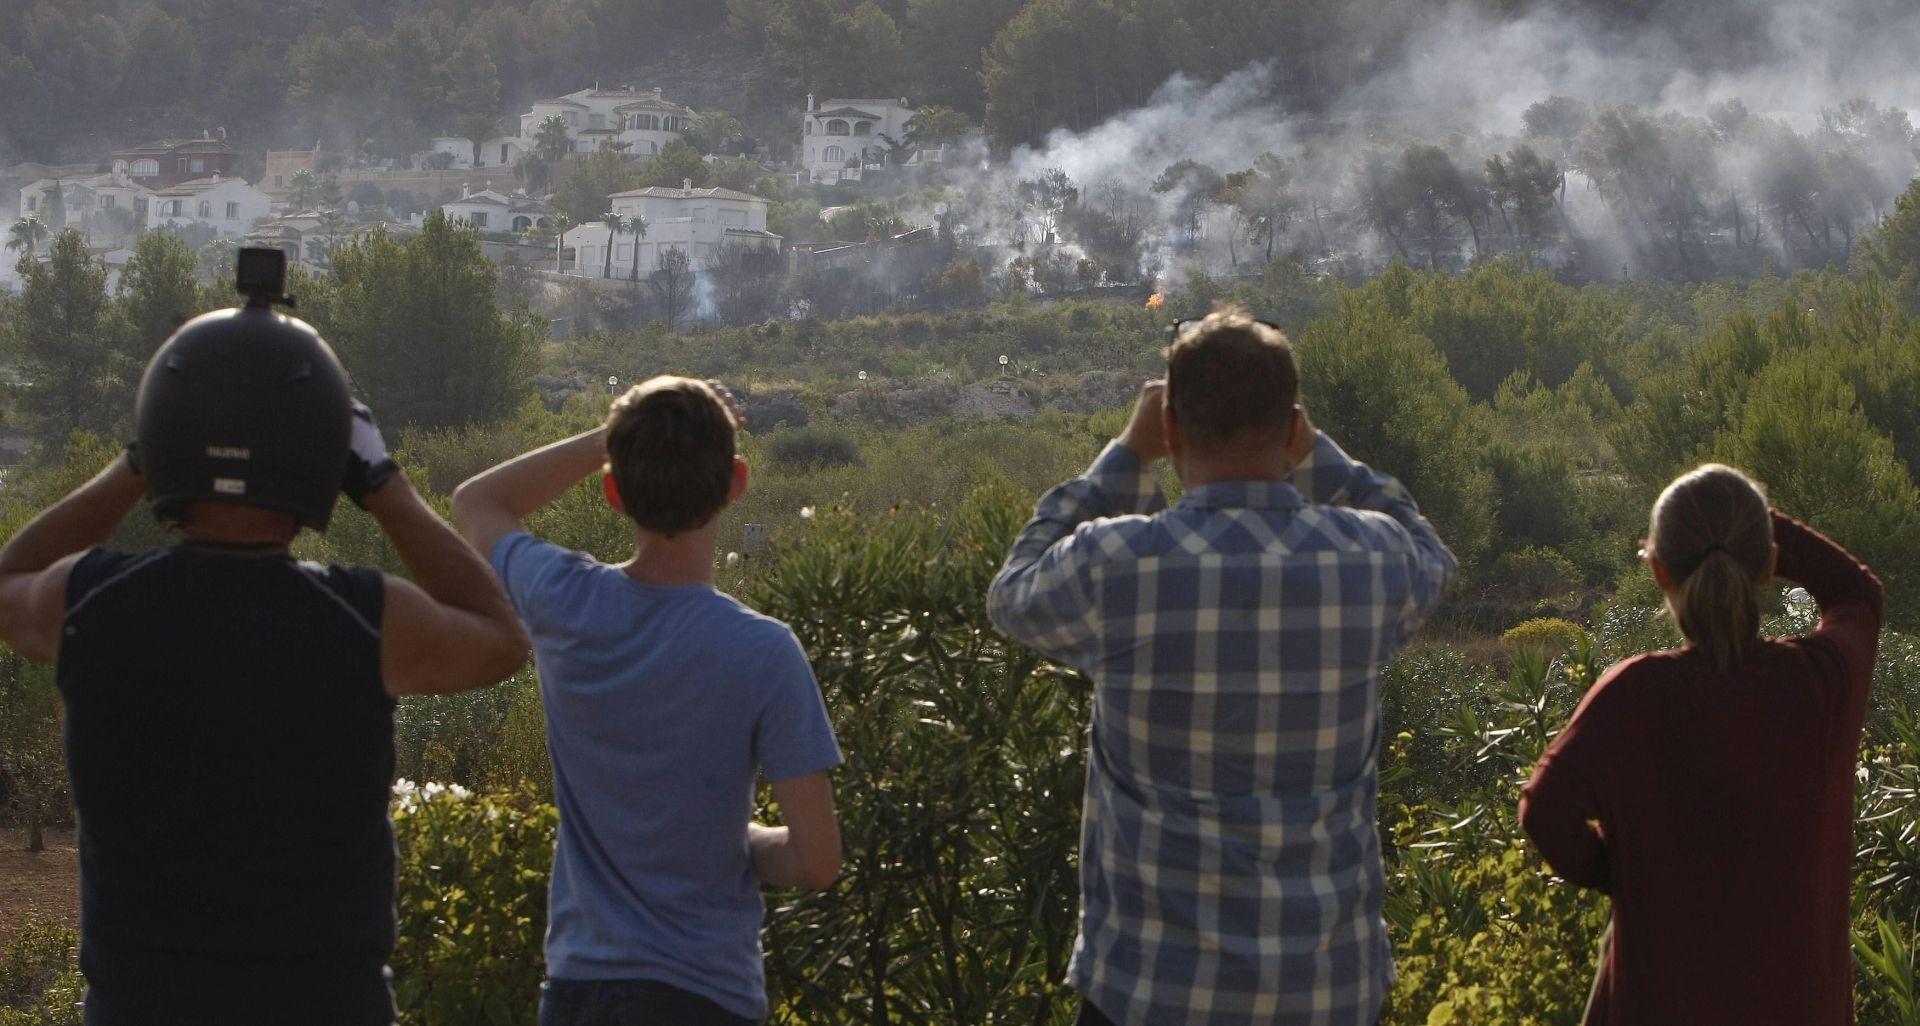 STOTINE LJUDI EVAKUIRANO Vatra 'hara' istočnom obalom Španjolske